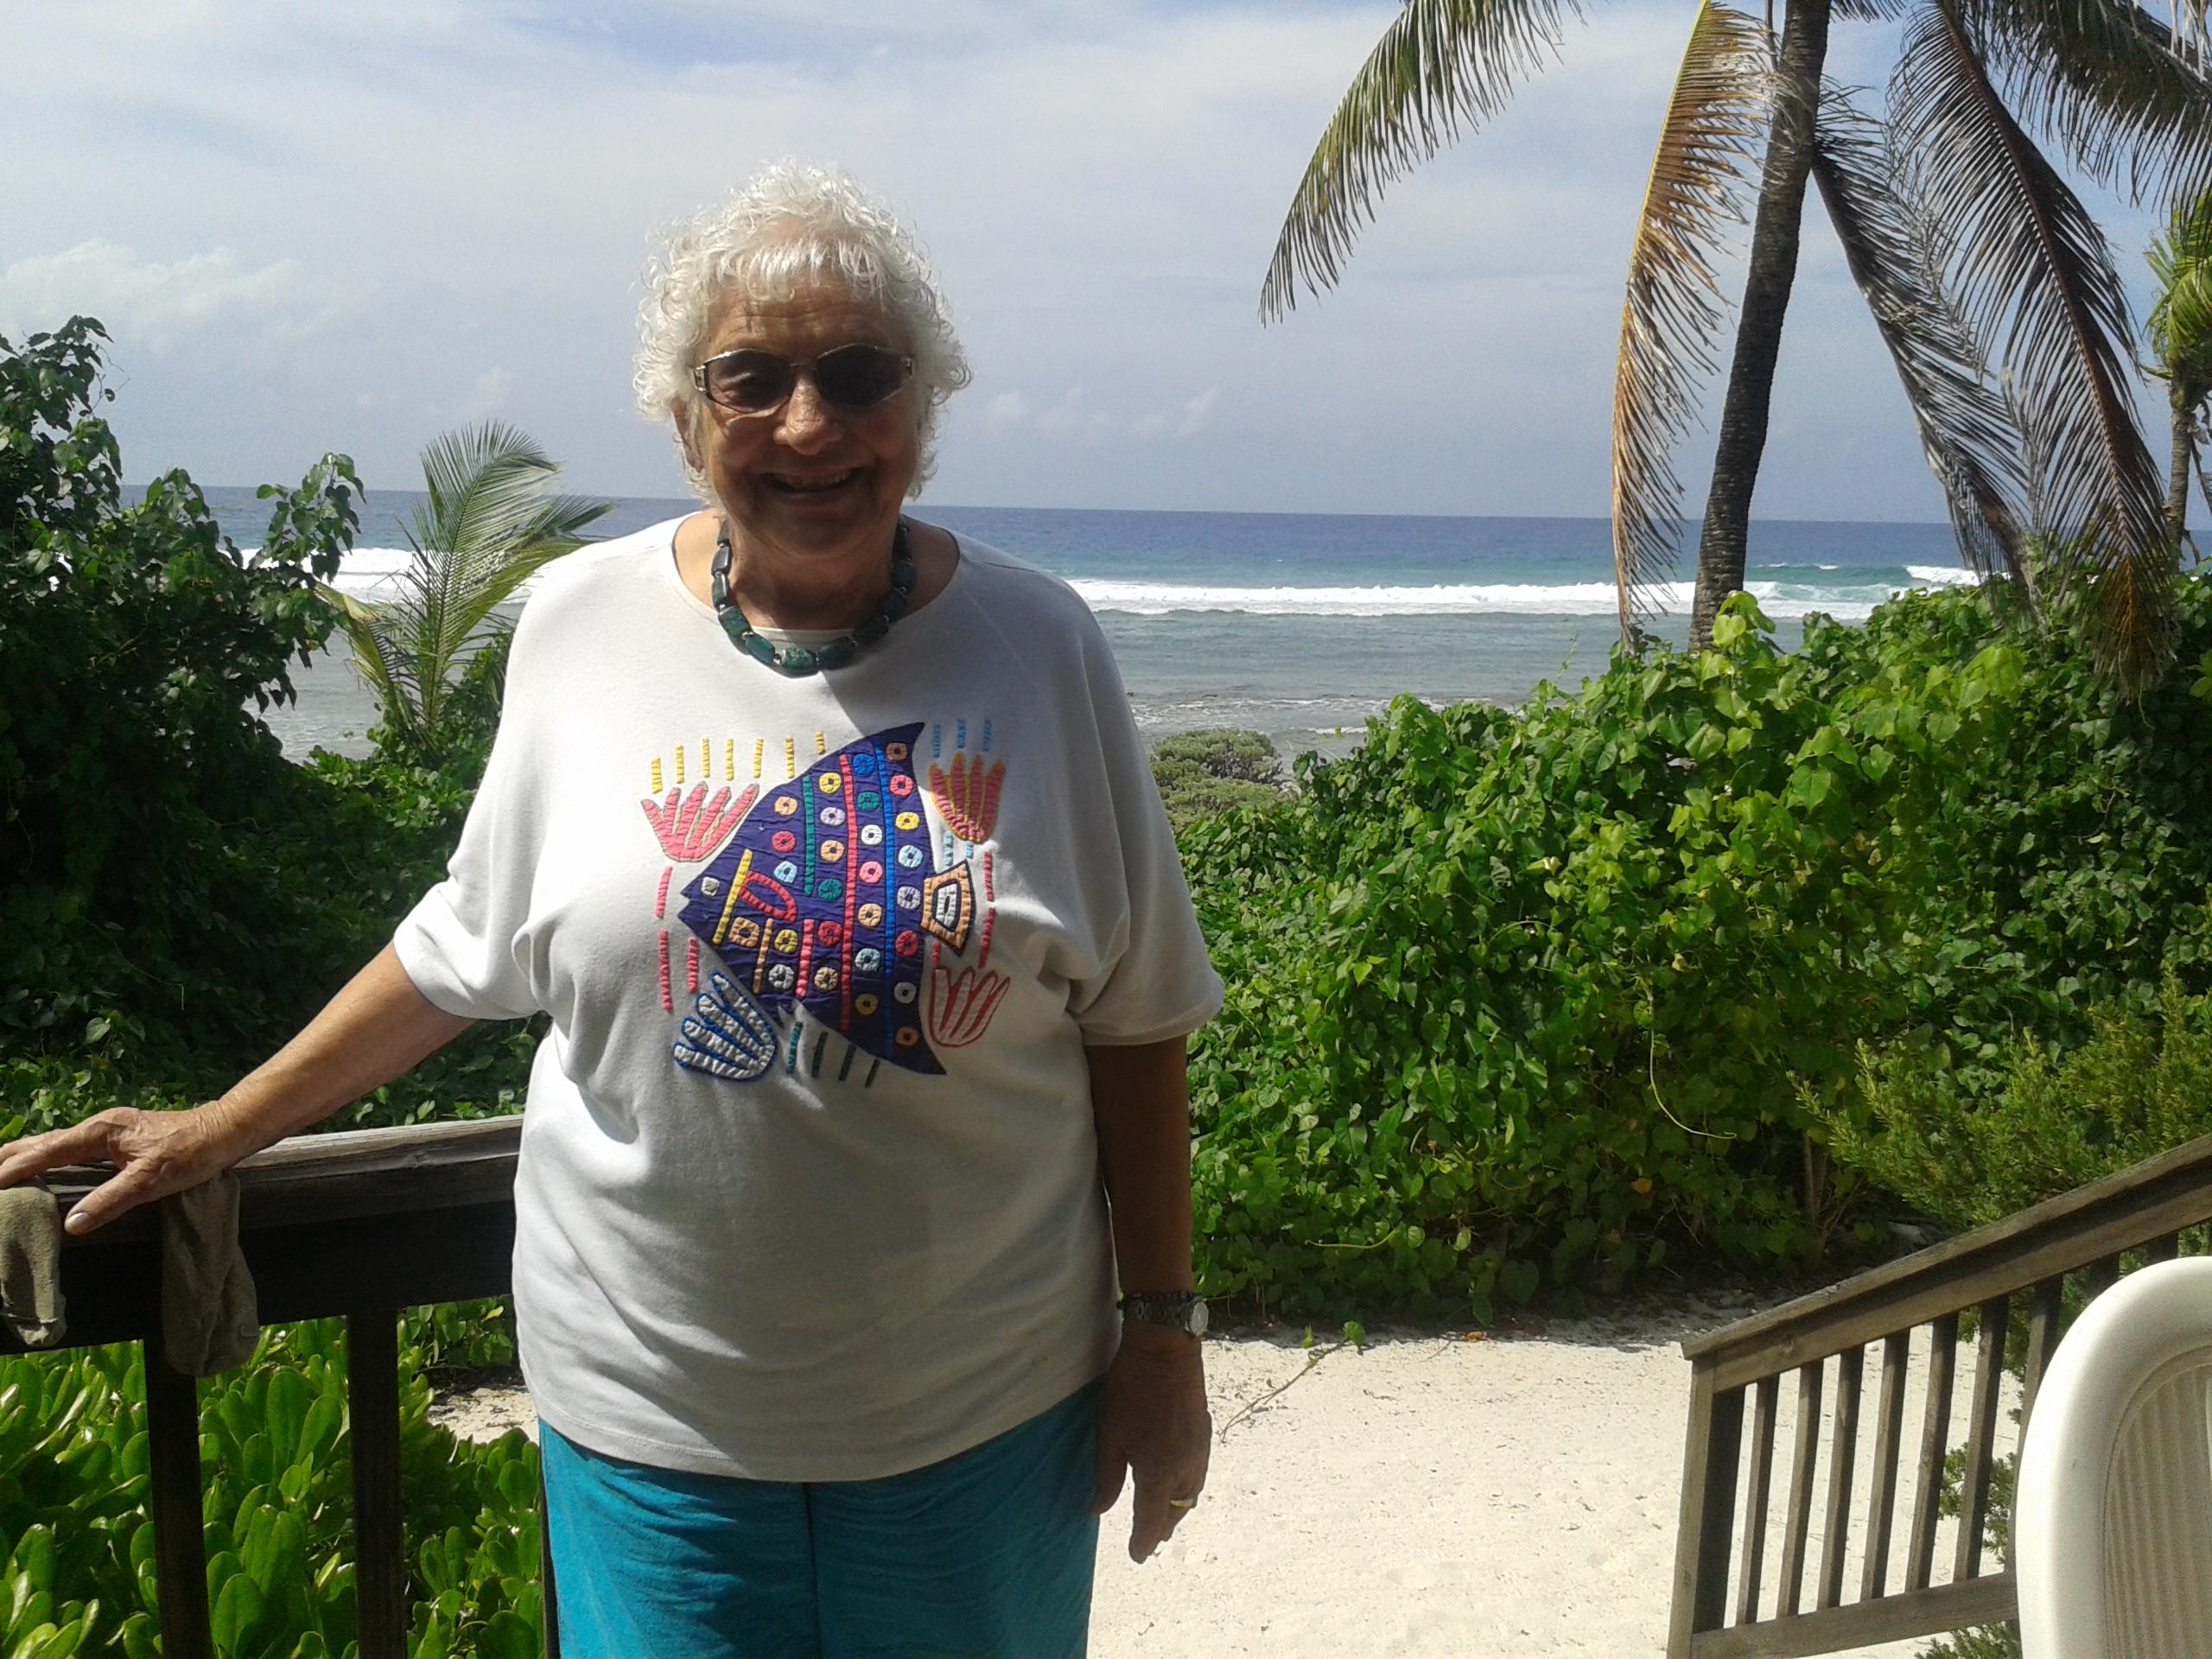 Gladys Howard runs the legendary Pirates Point resort on Little Cayman